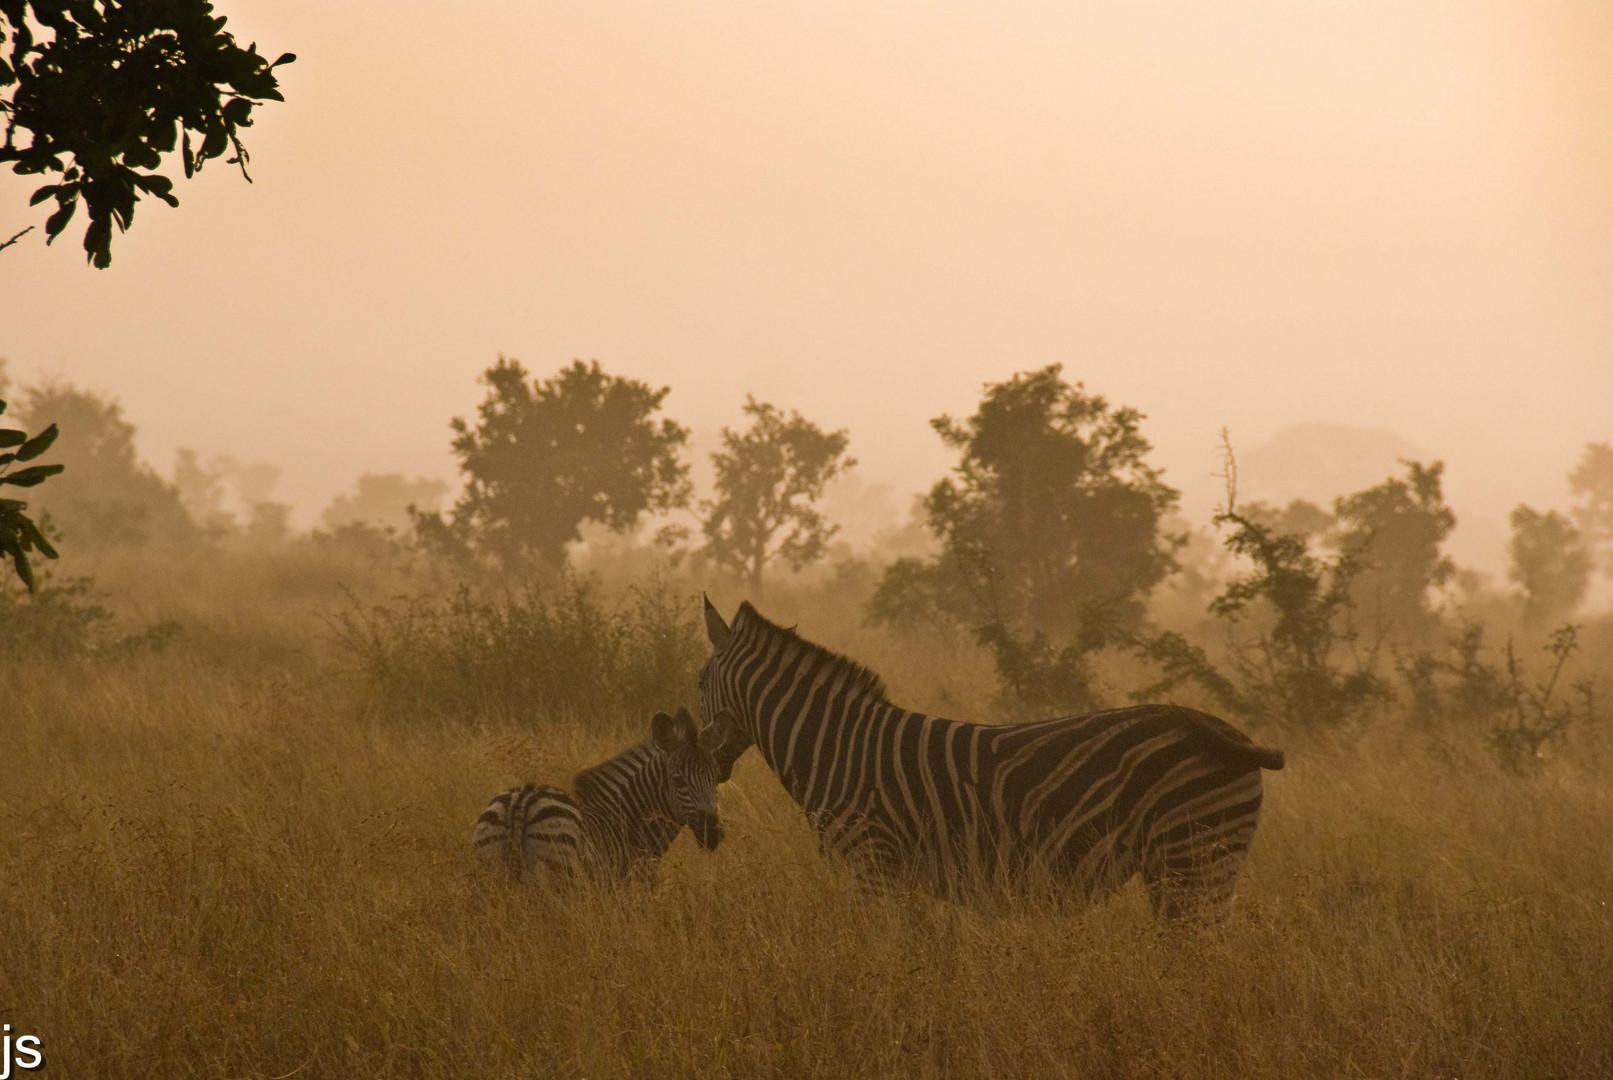 Afrika am Morgen